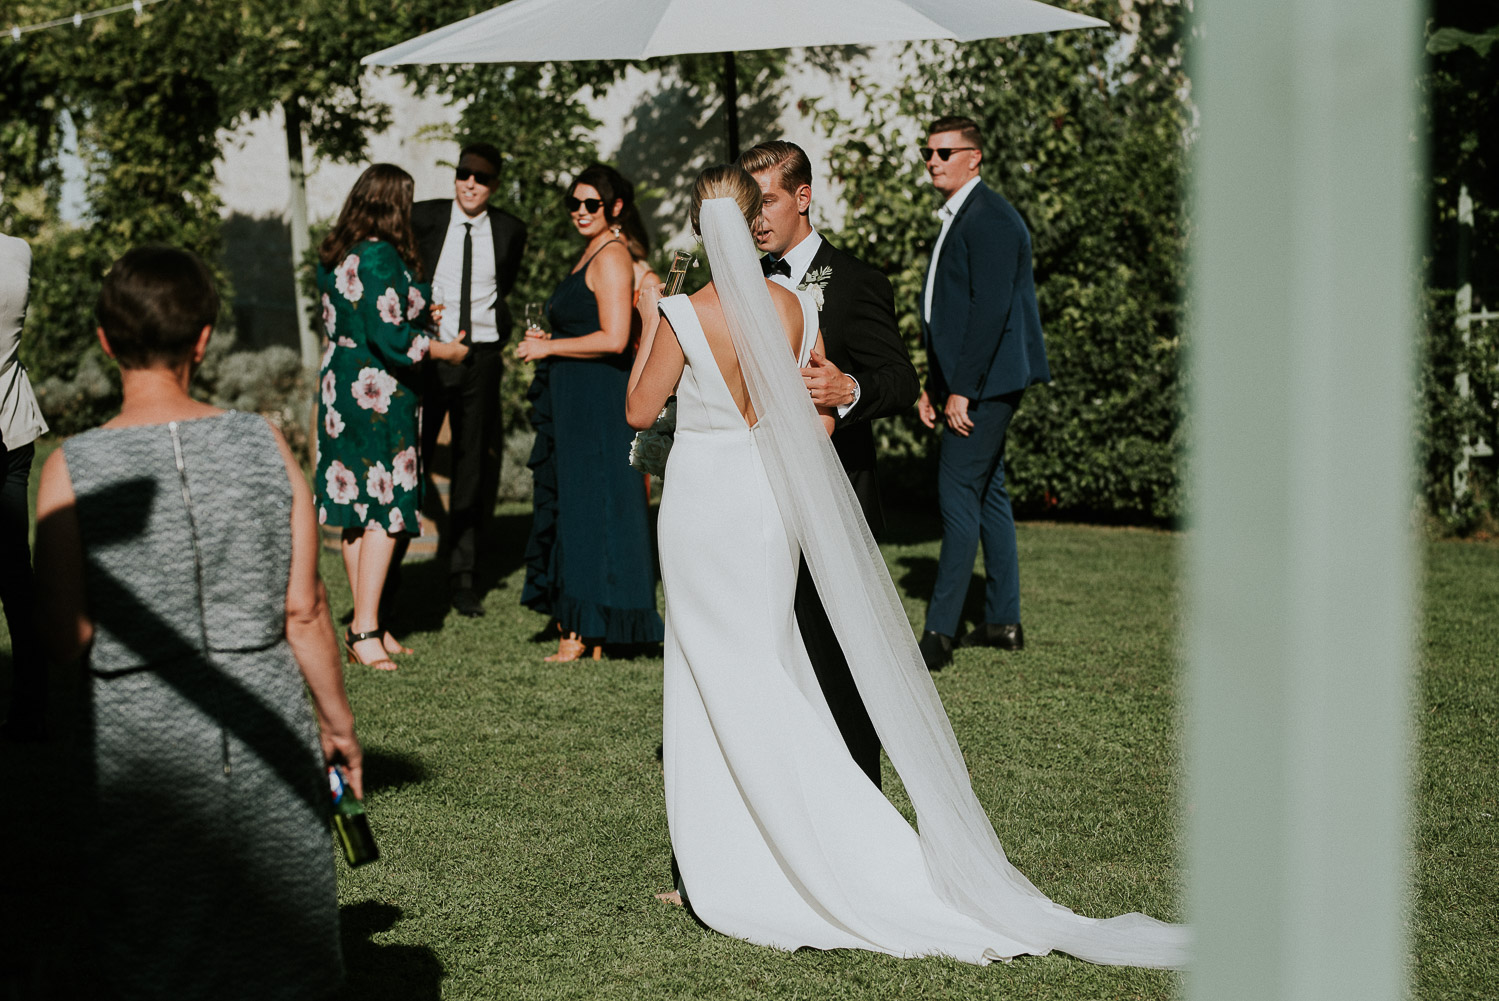 dordogne_eymet_wedding_france_katy_webb_photography_france_UK65